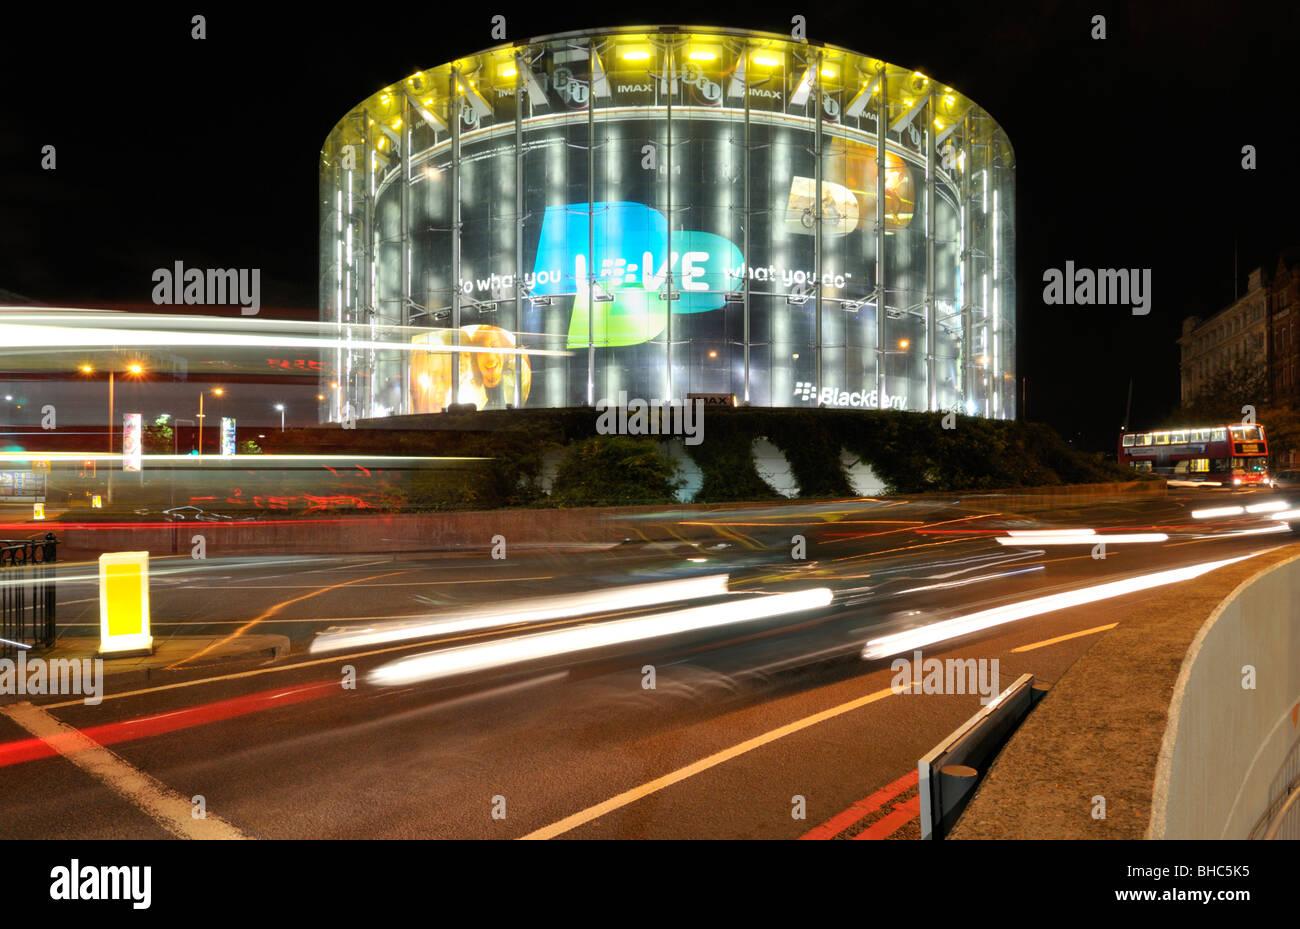 Light trails around the BFI IMAX cinema, Waterloo, London SE1, United Kingdom - Stock Image